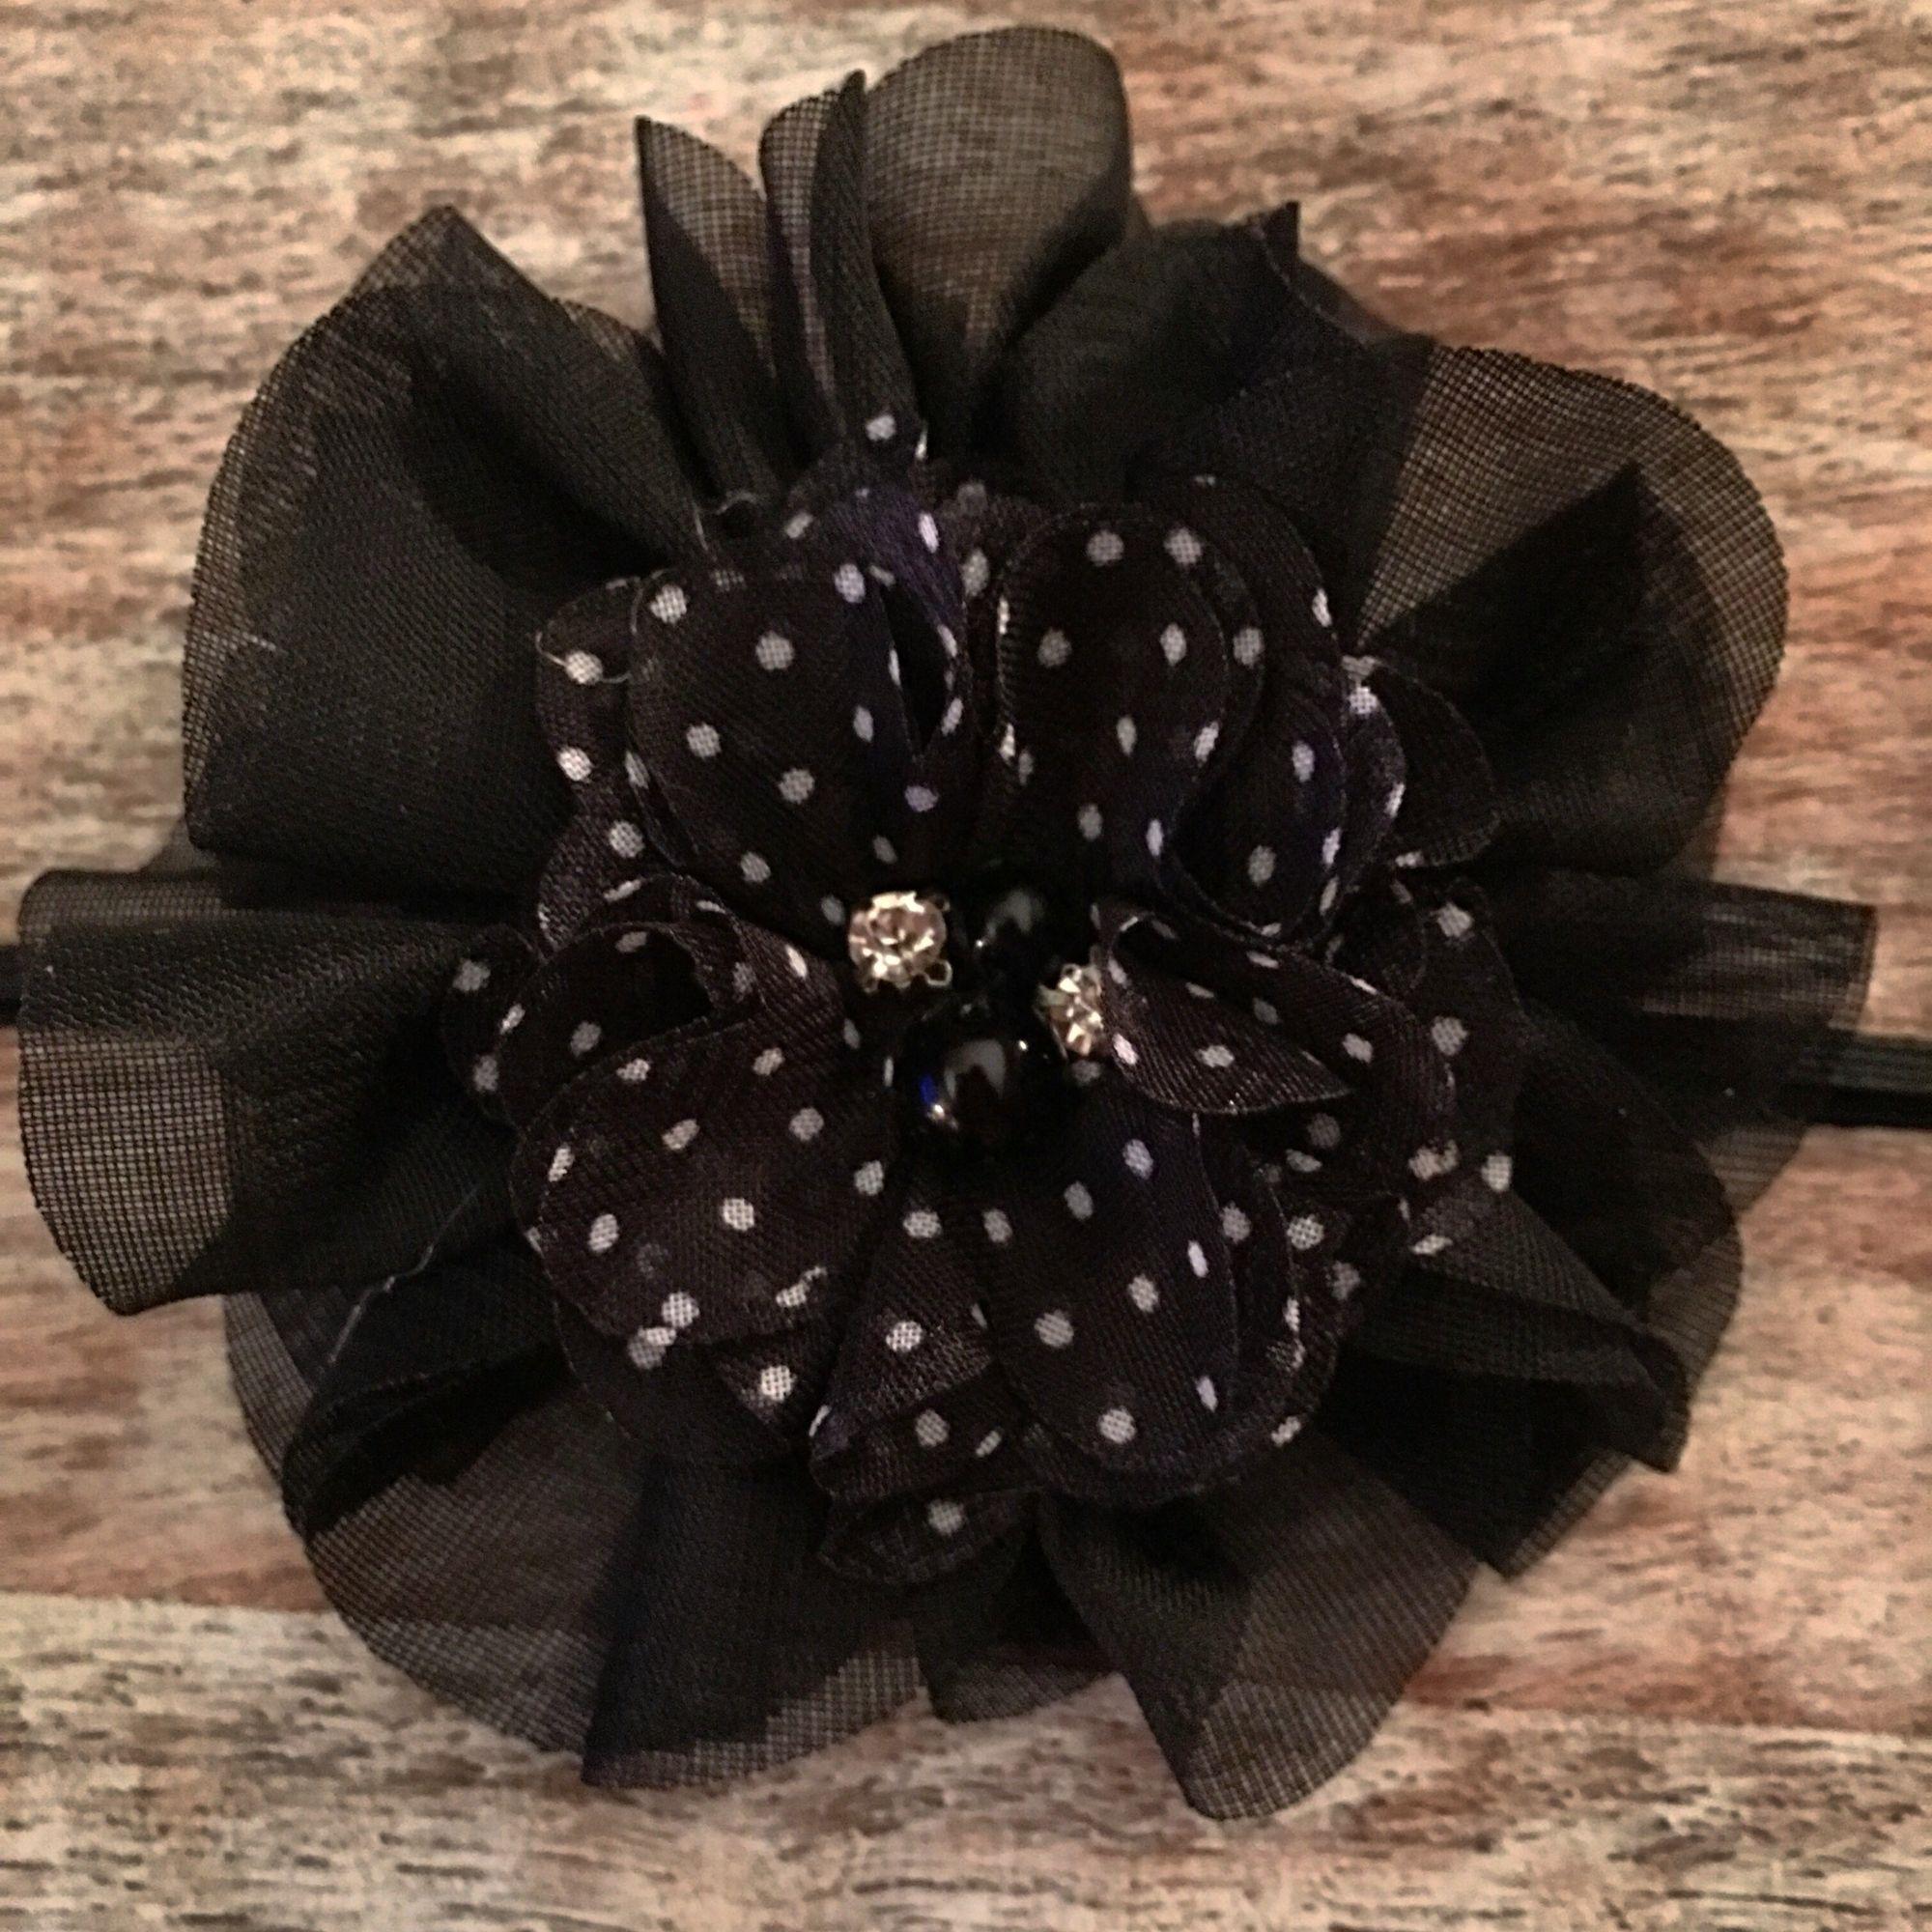 $8  Black & White Polka Dot Headband or Clip with  Double Flower, Rhinestone & Pearl Center